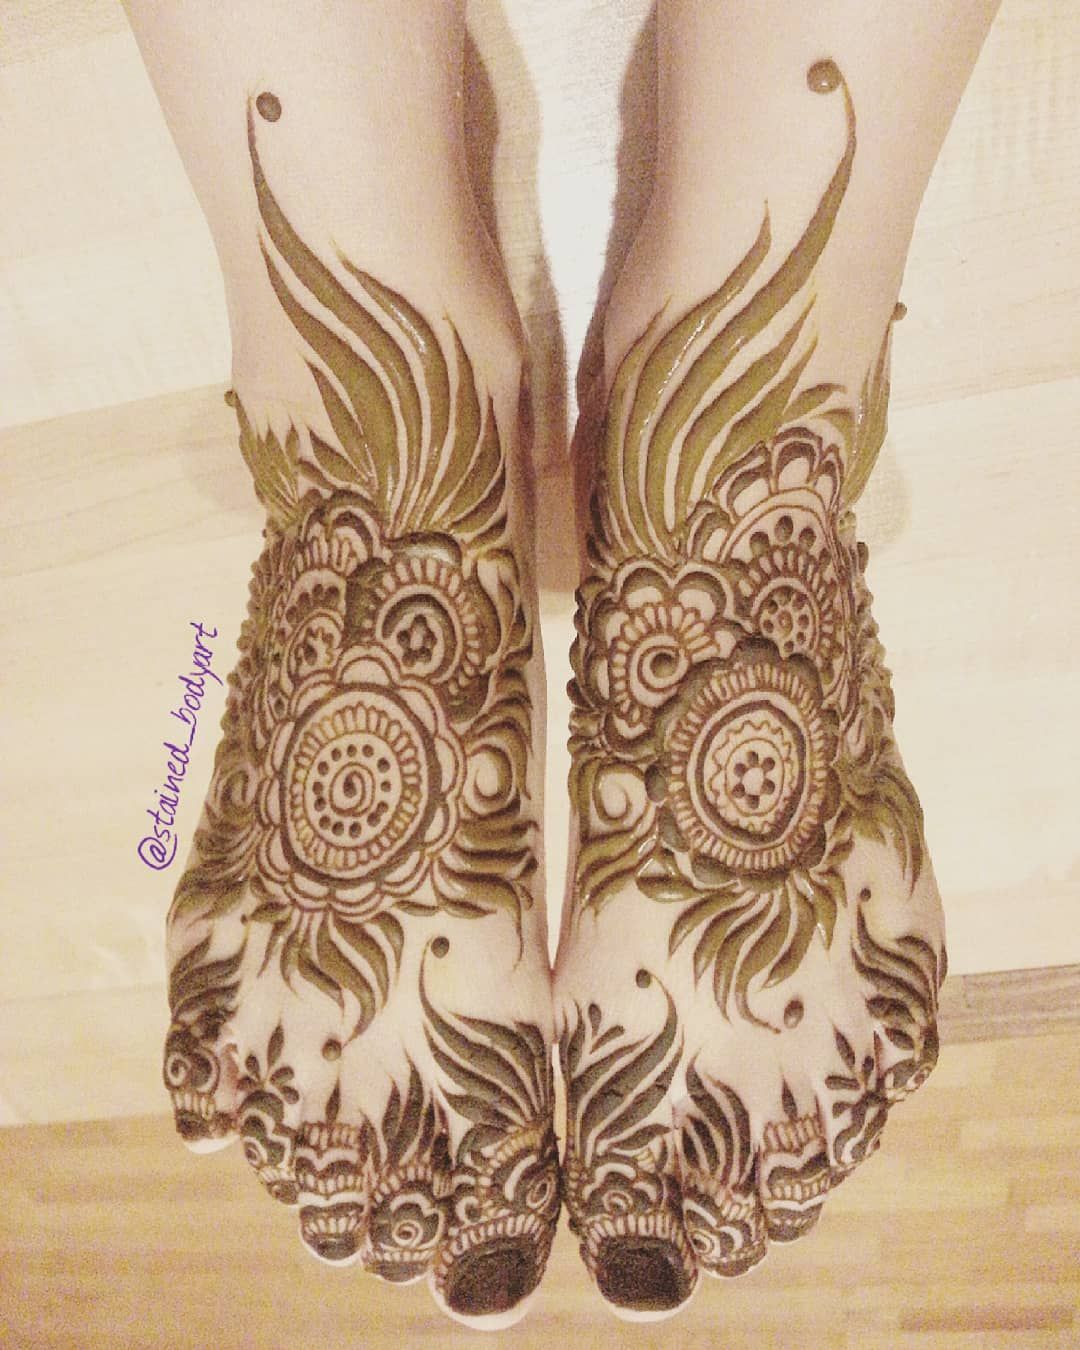 Henna On Feet And Toes Bold Khaleeji Syle Stainedbodyart Com Fb Stainedhennabodyart Khafif Mehndi Design Henna Designs Feet Mehndi Designs